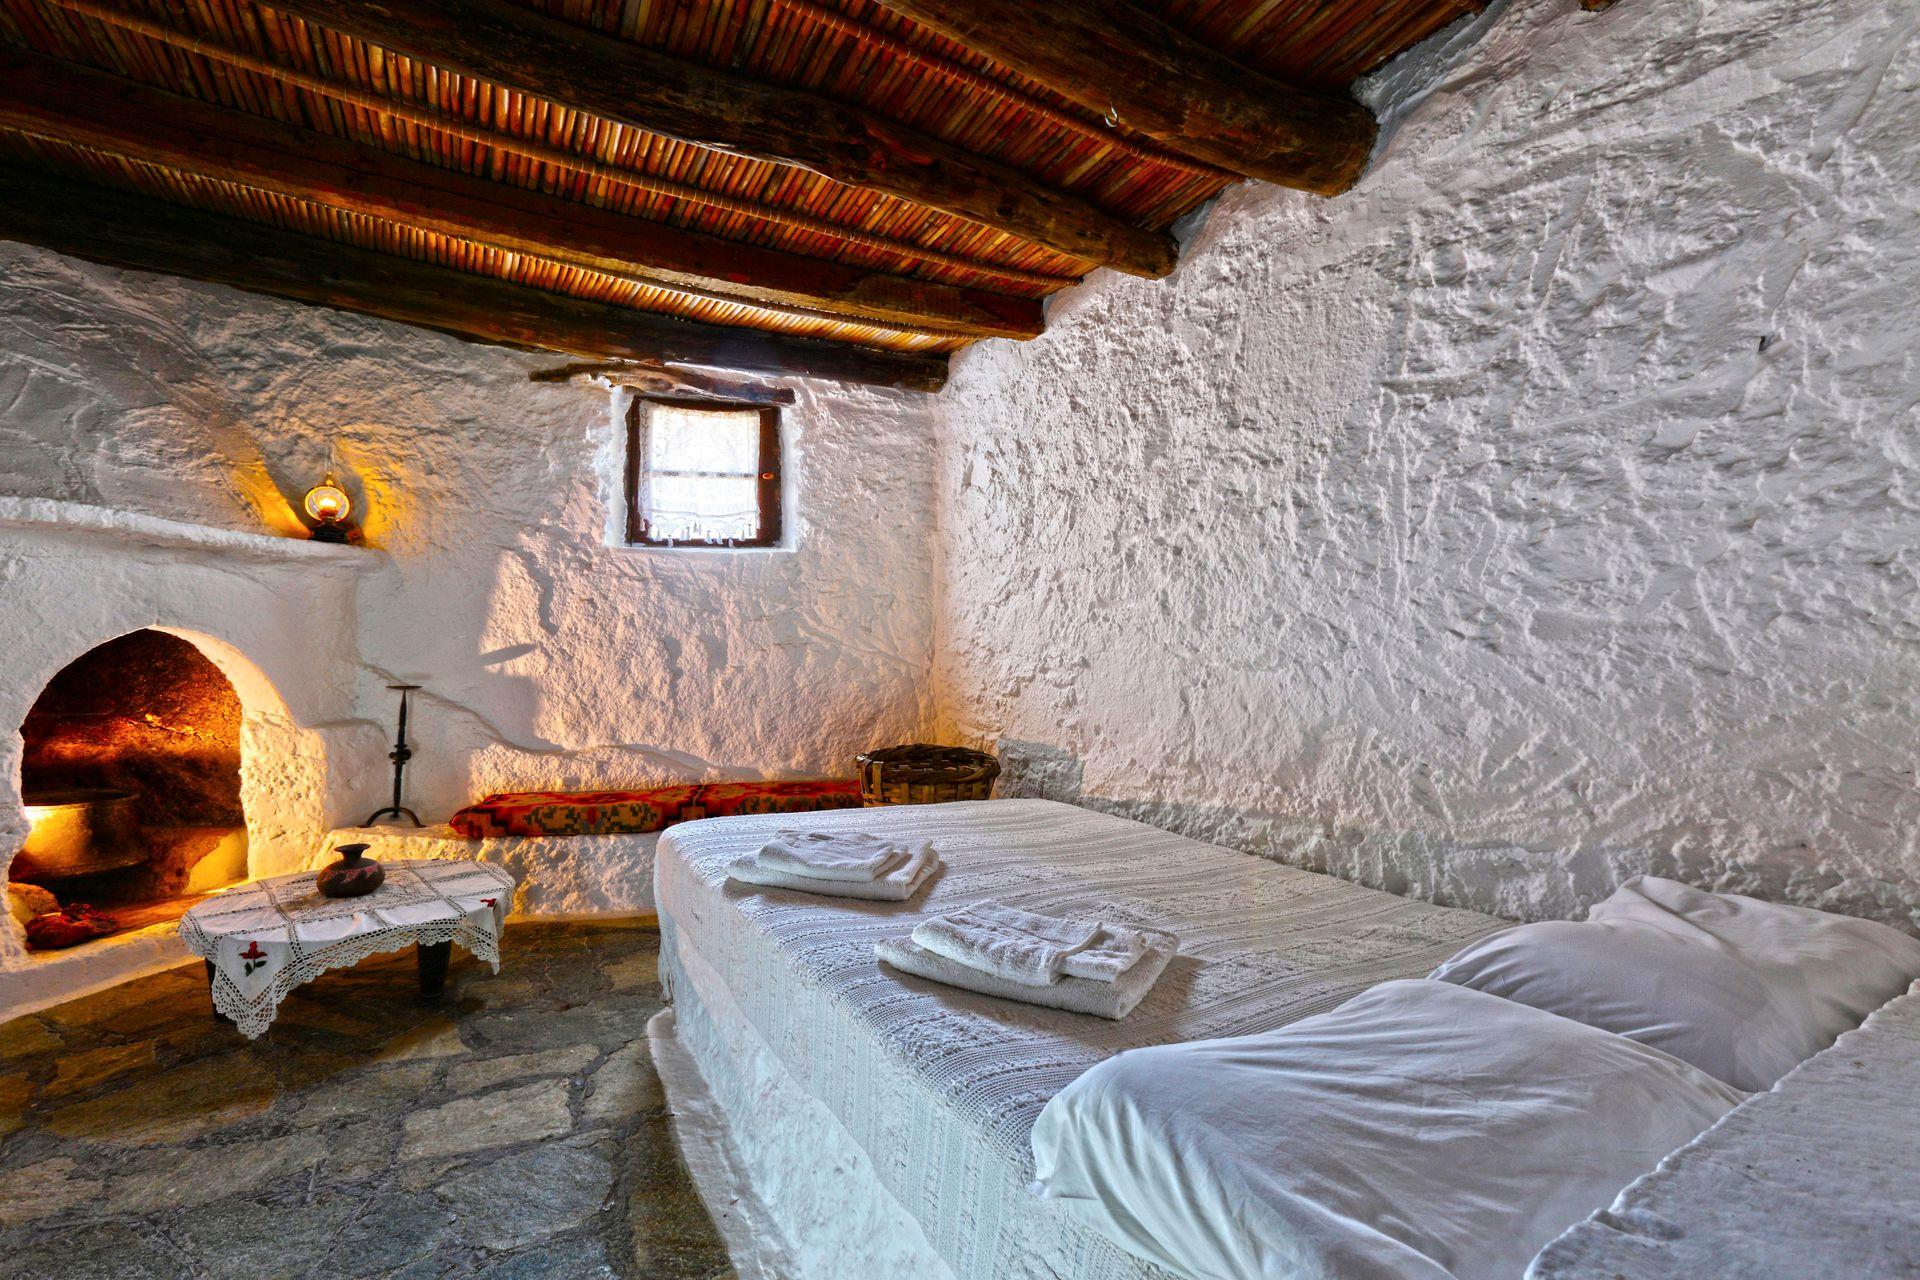 Aspros Potamos Houses - Μακρύς Γιαλός, Κρήτη ✦ 5 Ημέρες